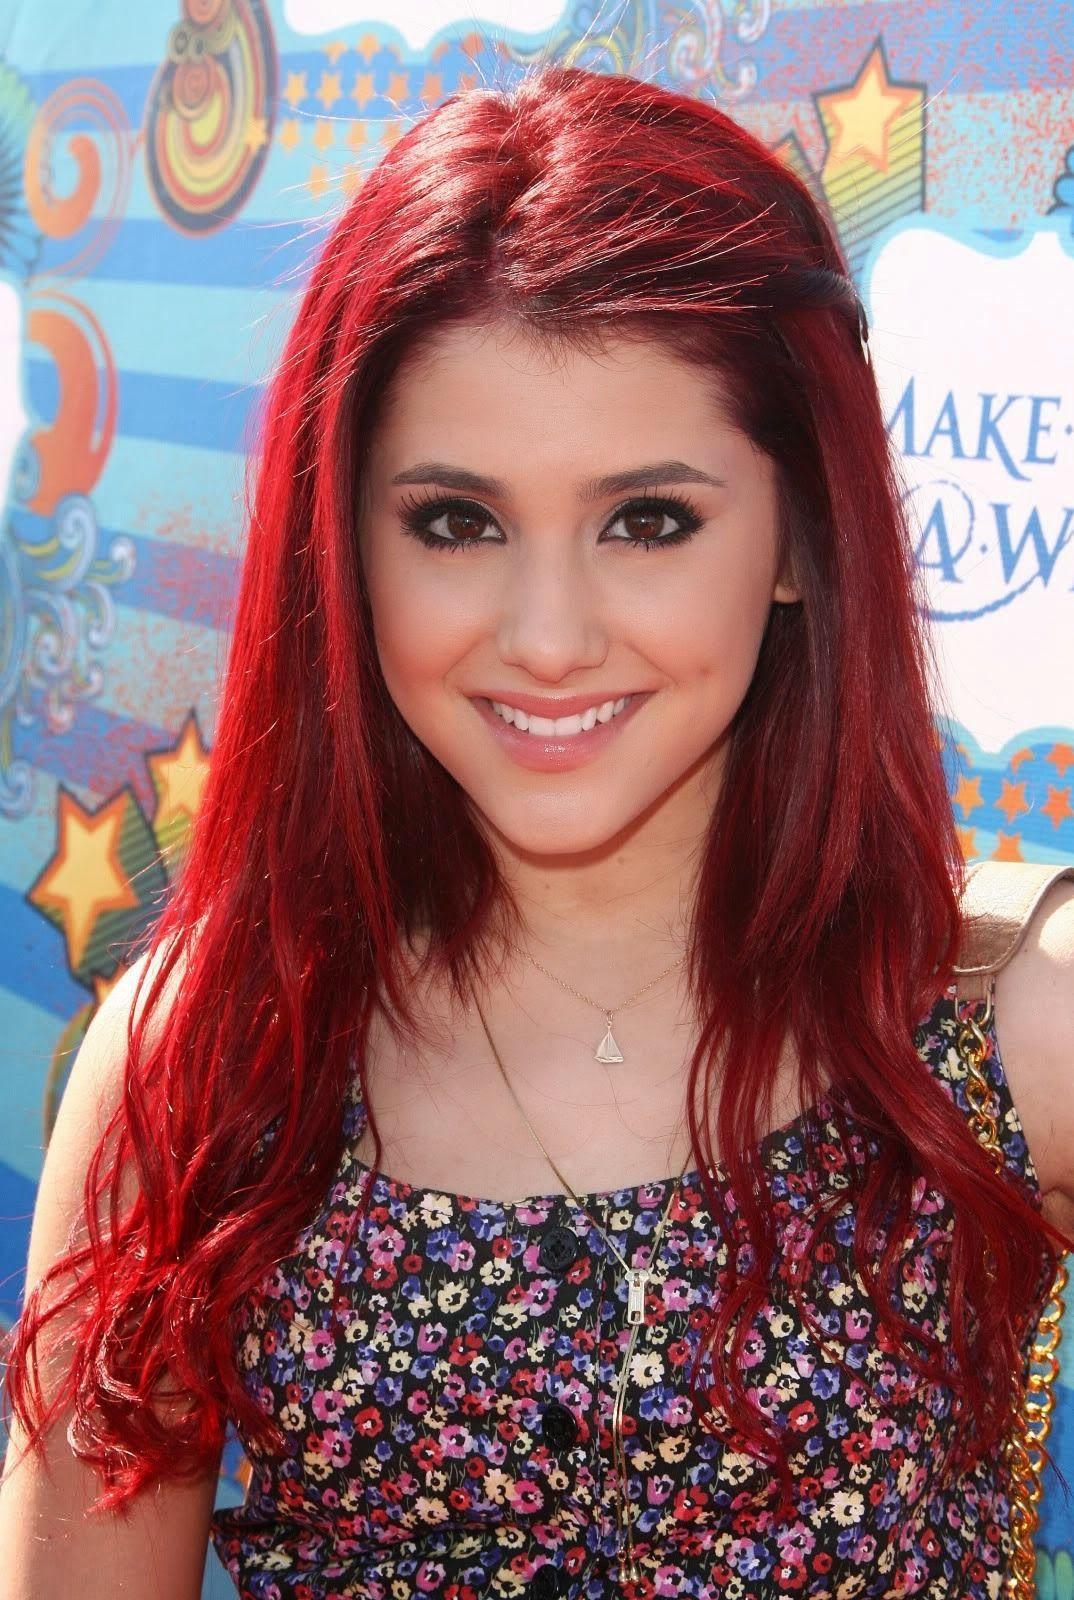 Ariana Grande Red Hair Color Photo Hairbeauty Ariana